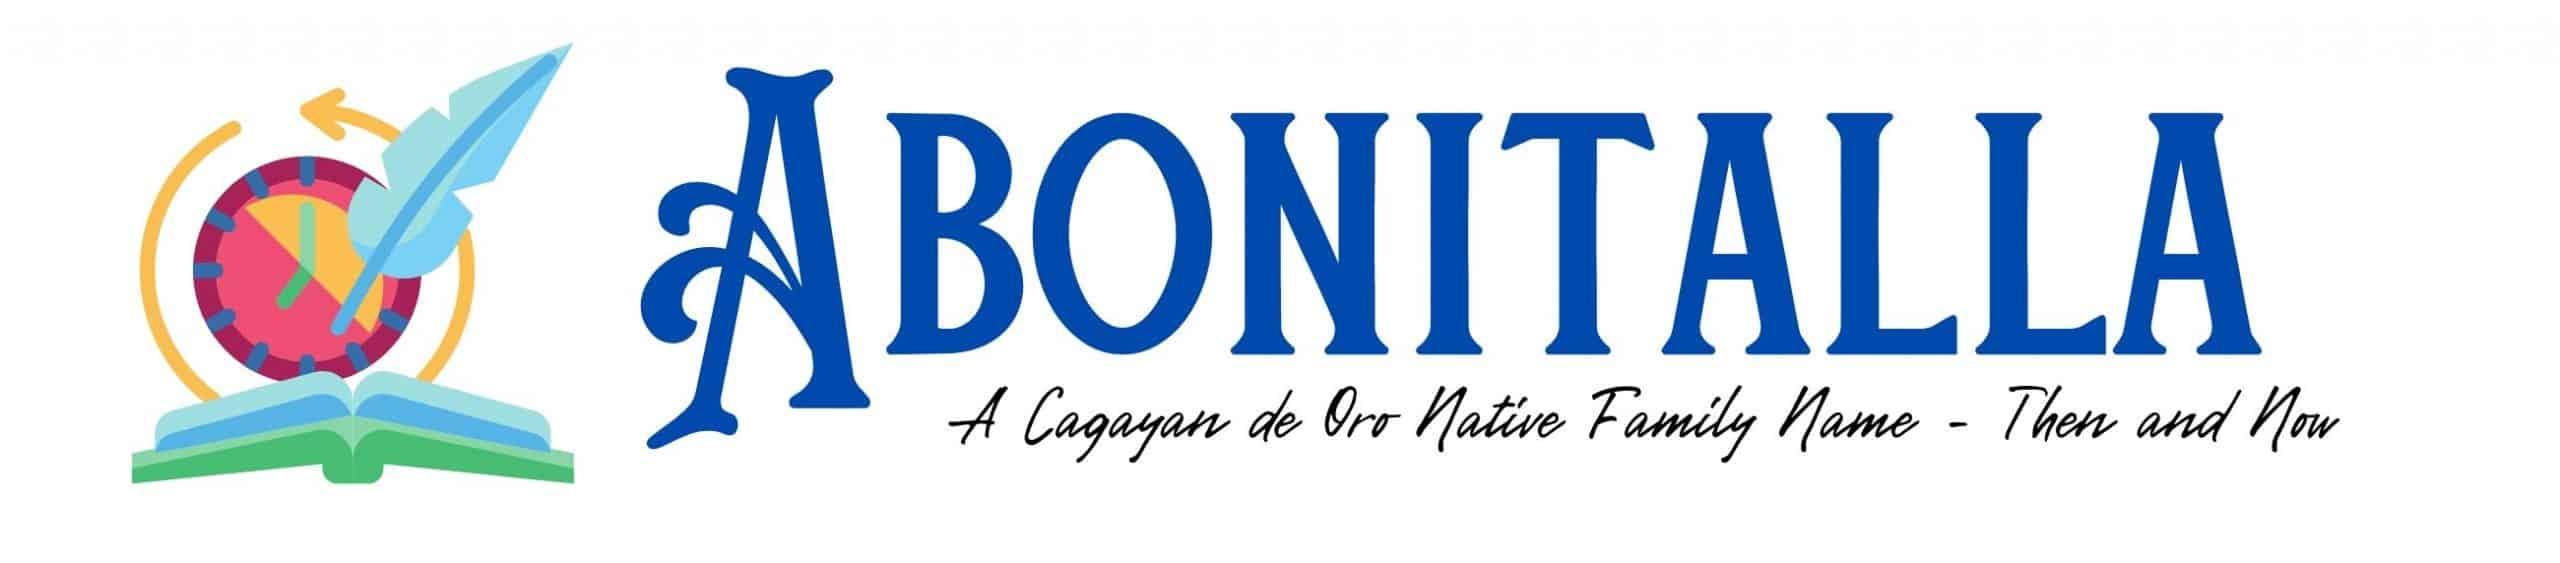 Abonitalla